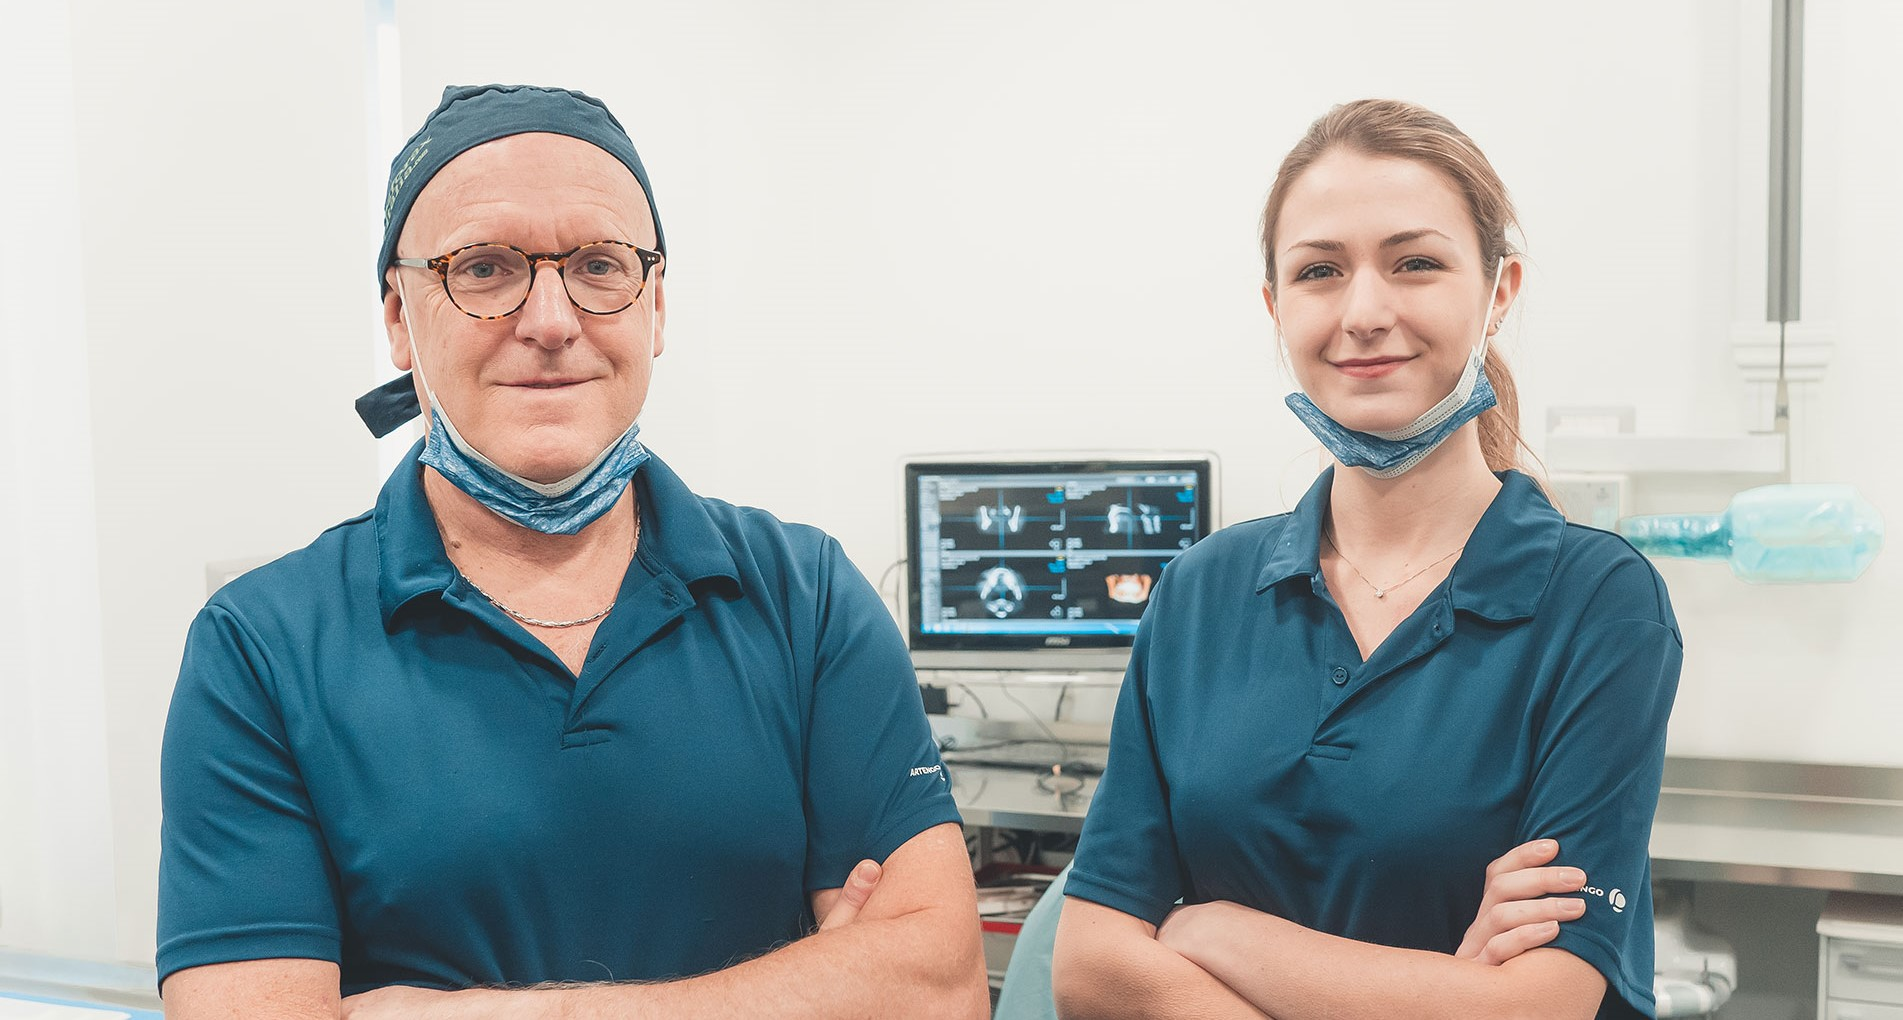 Dott. Paolo Ferrario Odontoiatra Medico Chirurgo Dott.ssa Susanna Ferrario